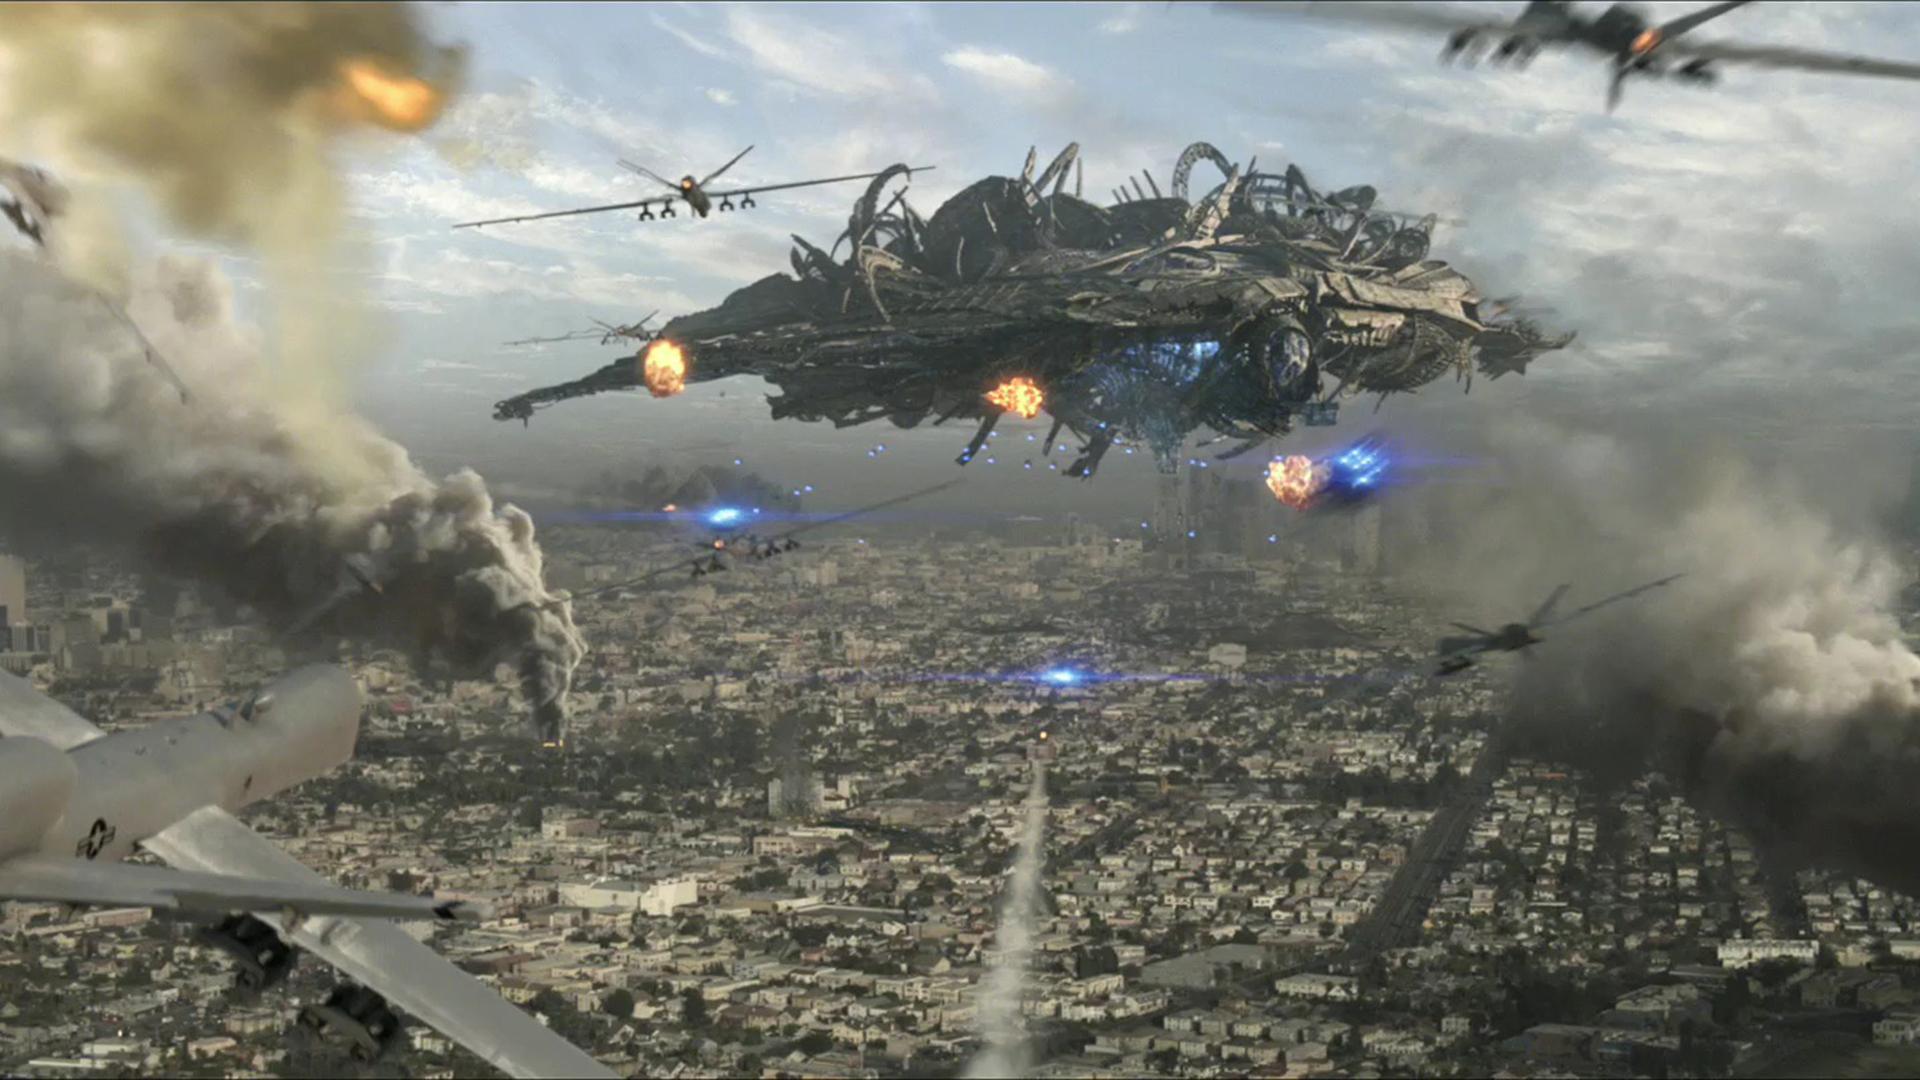 Скайлайн / Skyline (2010) BDRip 720p